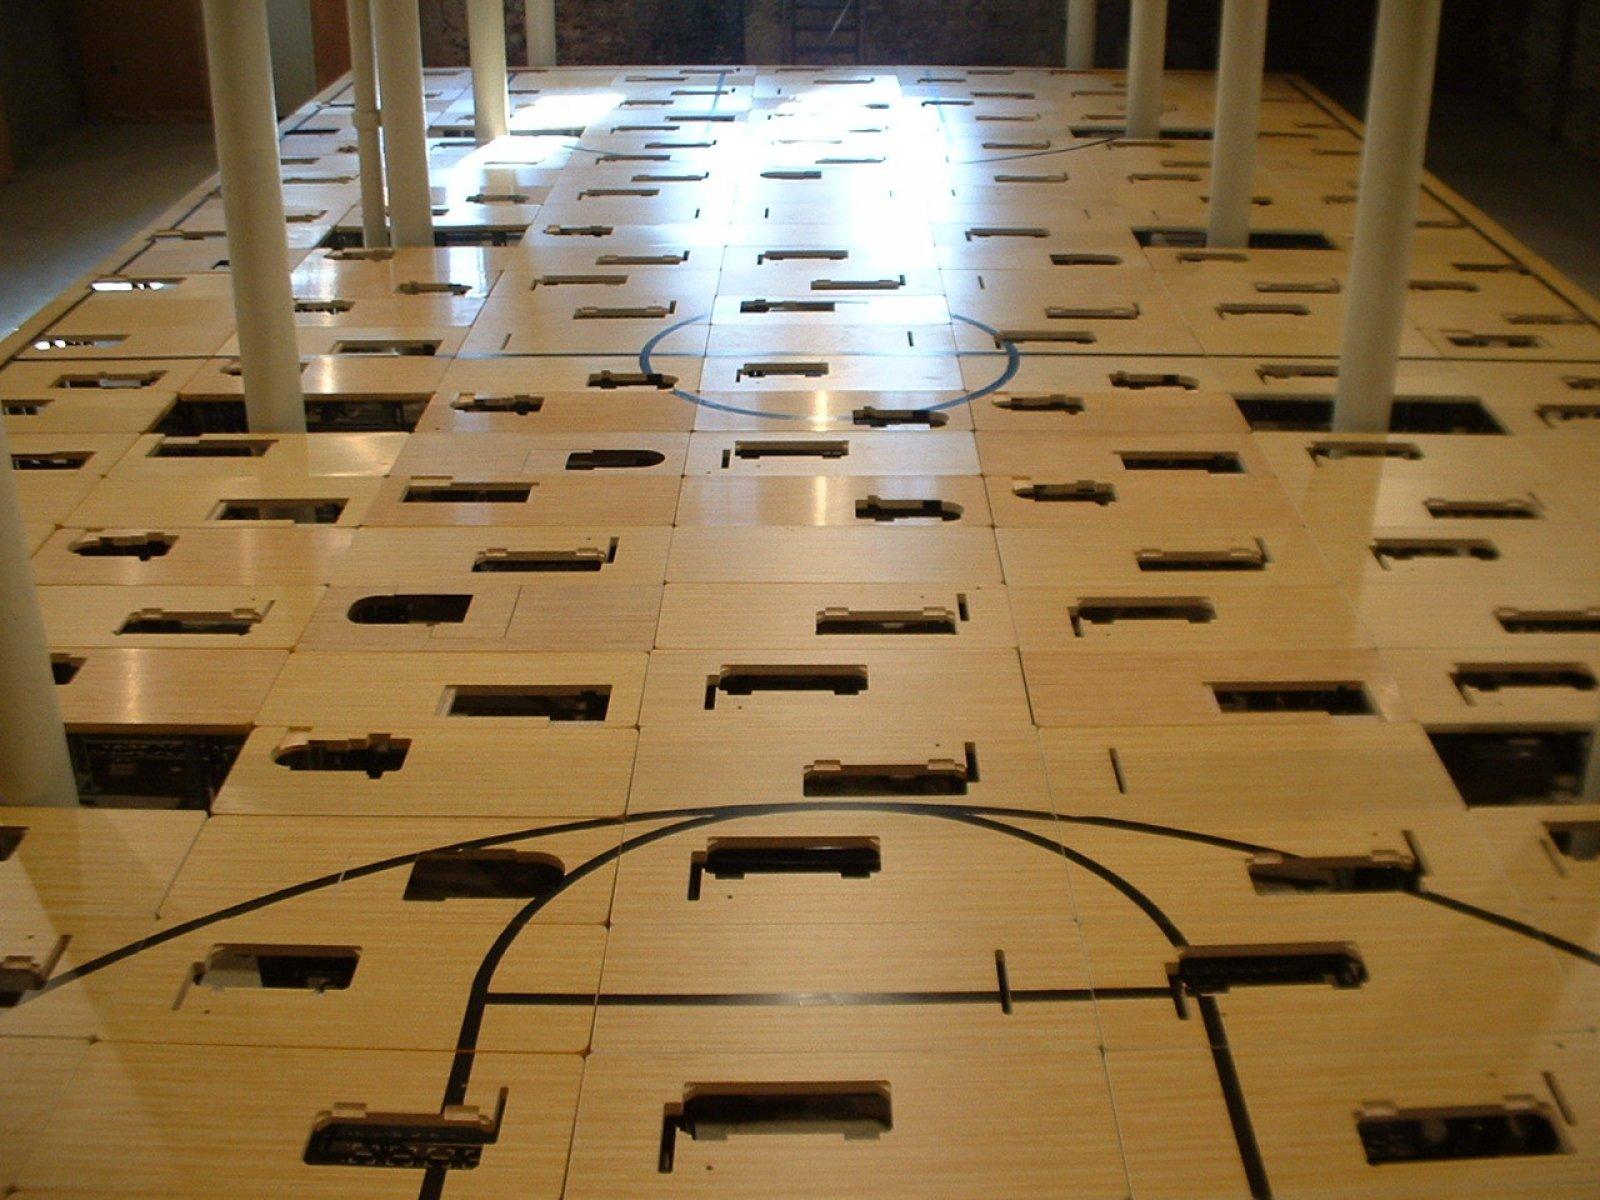 Brian Jungen,Court, 2004,224 sweatshop tables, paint, 2 rolling steel warehouse ladders, 2 basketball hoops each with net and backboard, 148 x 336 x 840 in. (376 x 853 x 2134 cm)